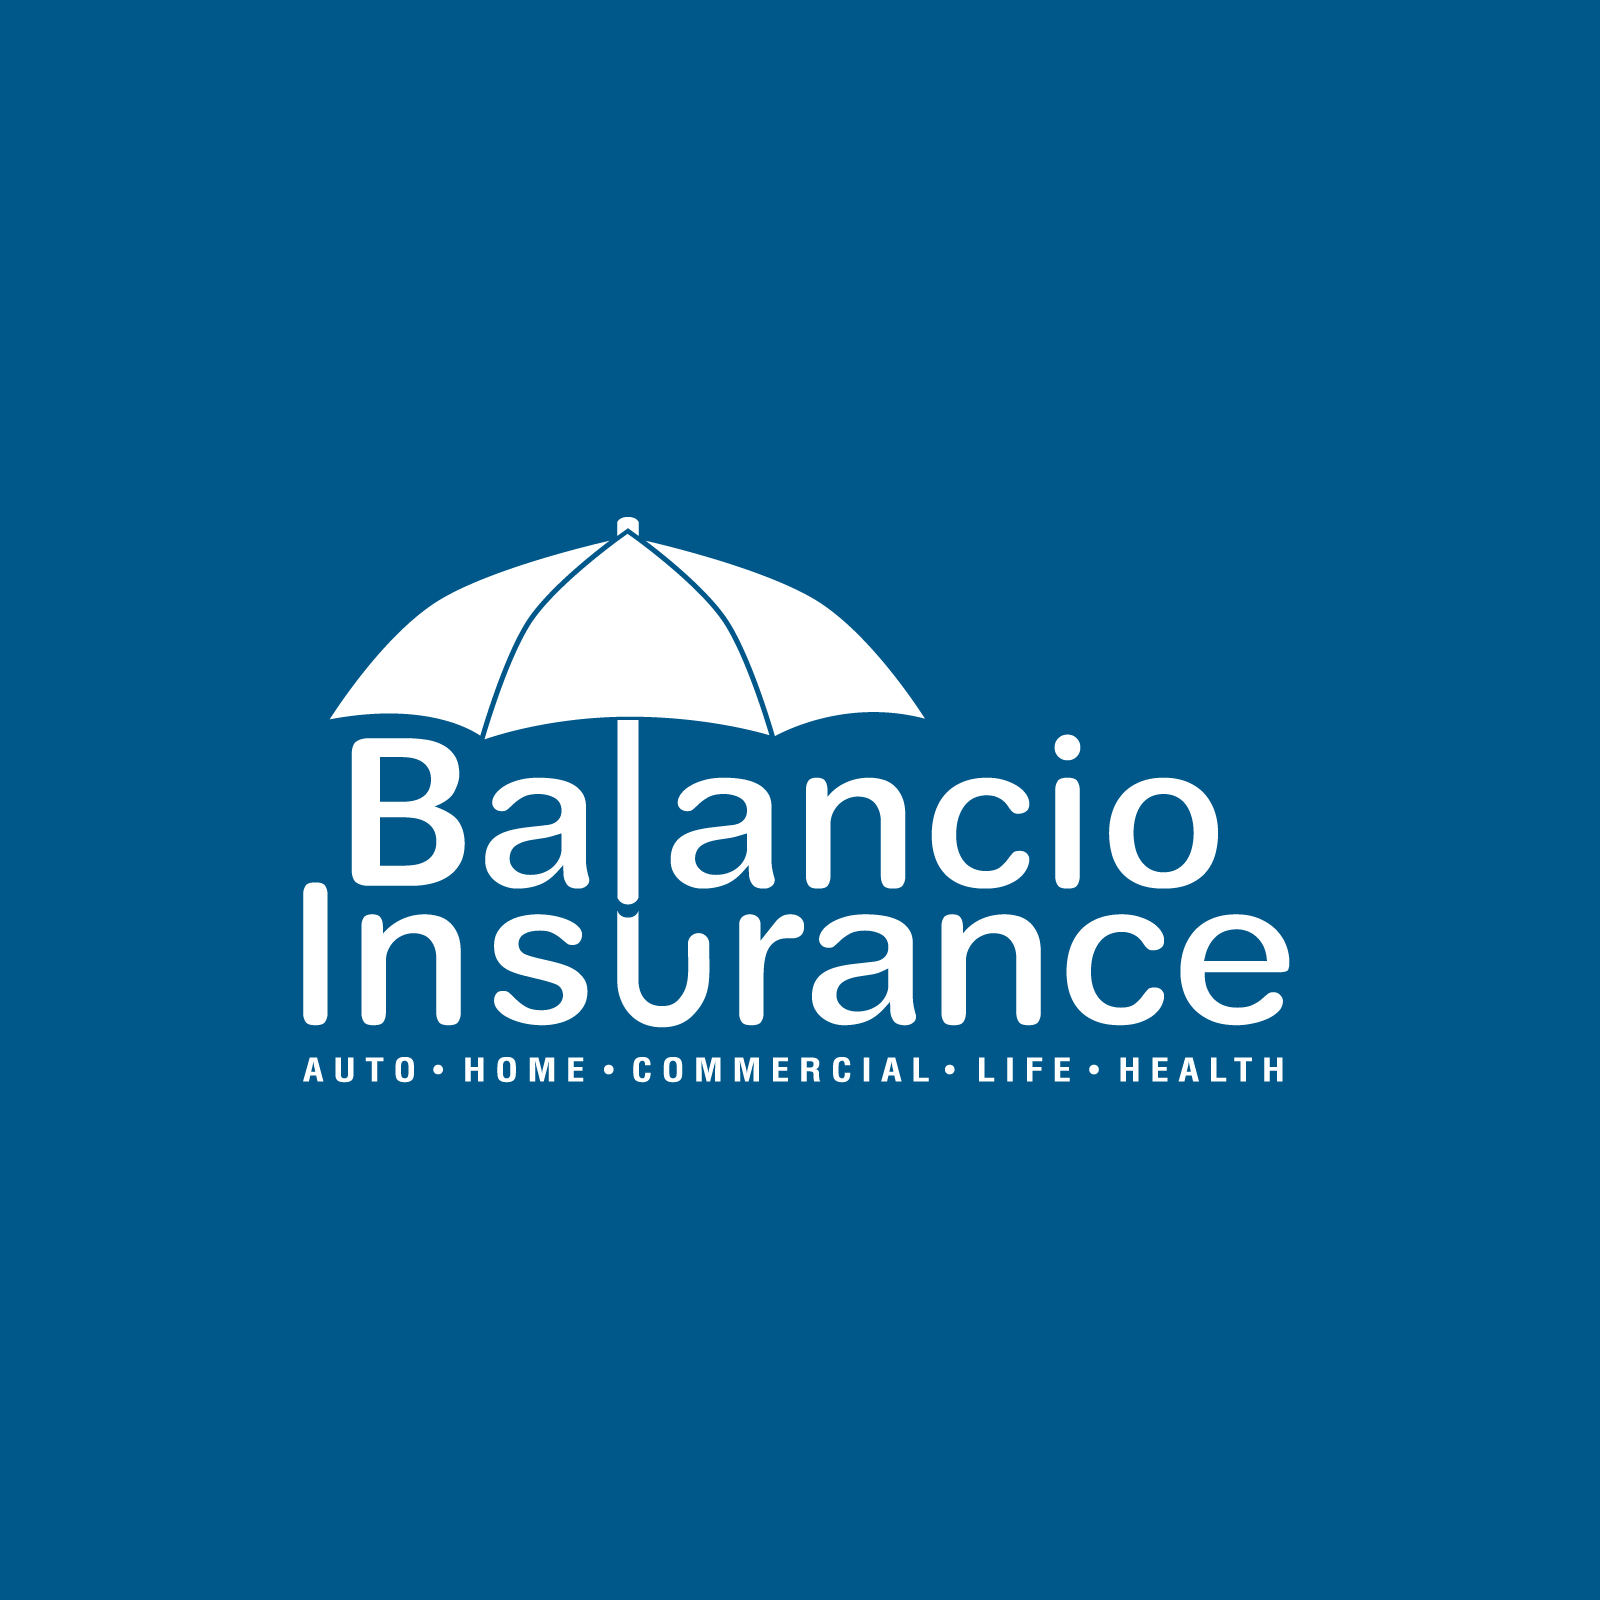 Balancio Insurance